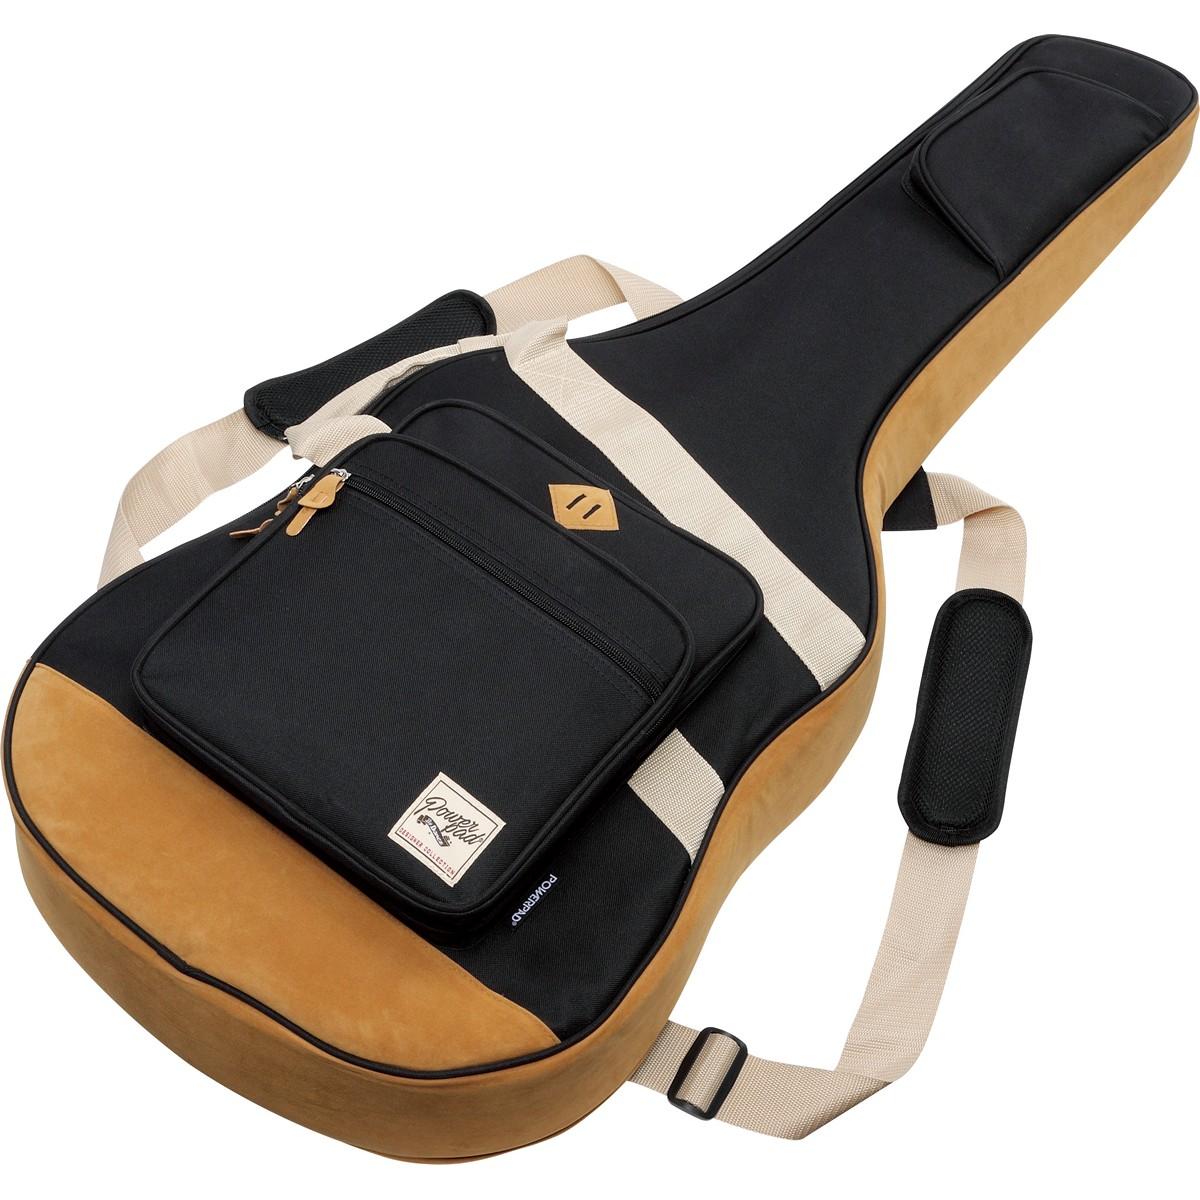 IBANEZ IHB541-BK BLACK BAG ELECTRIC GUITAR (HOLLOW BODY)